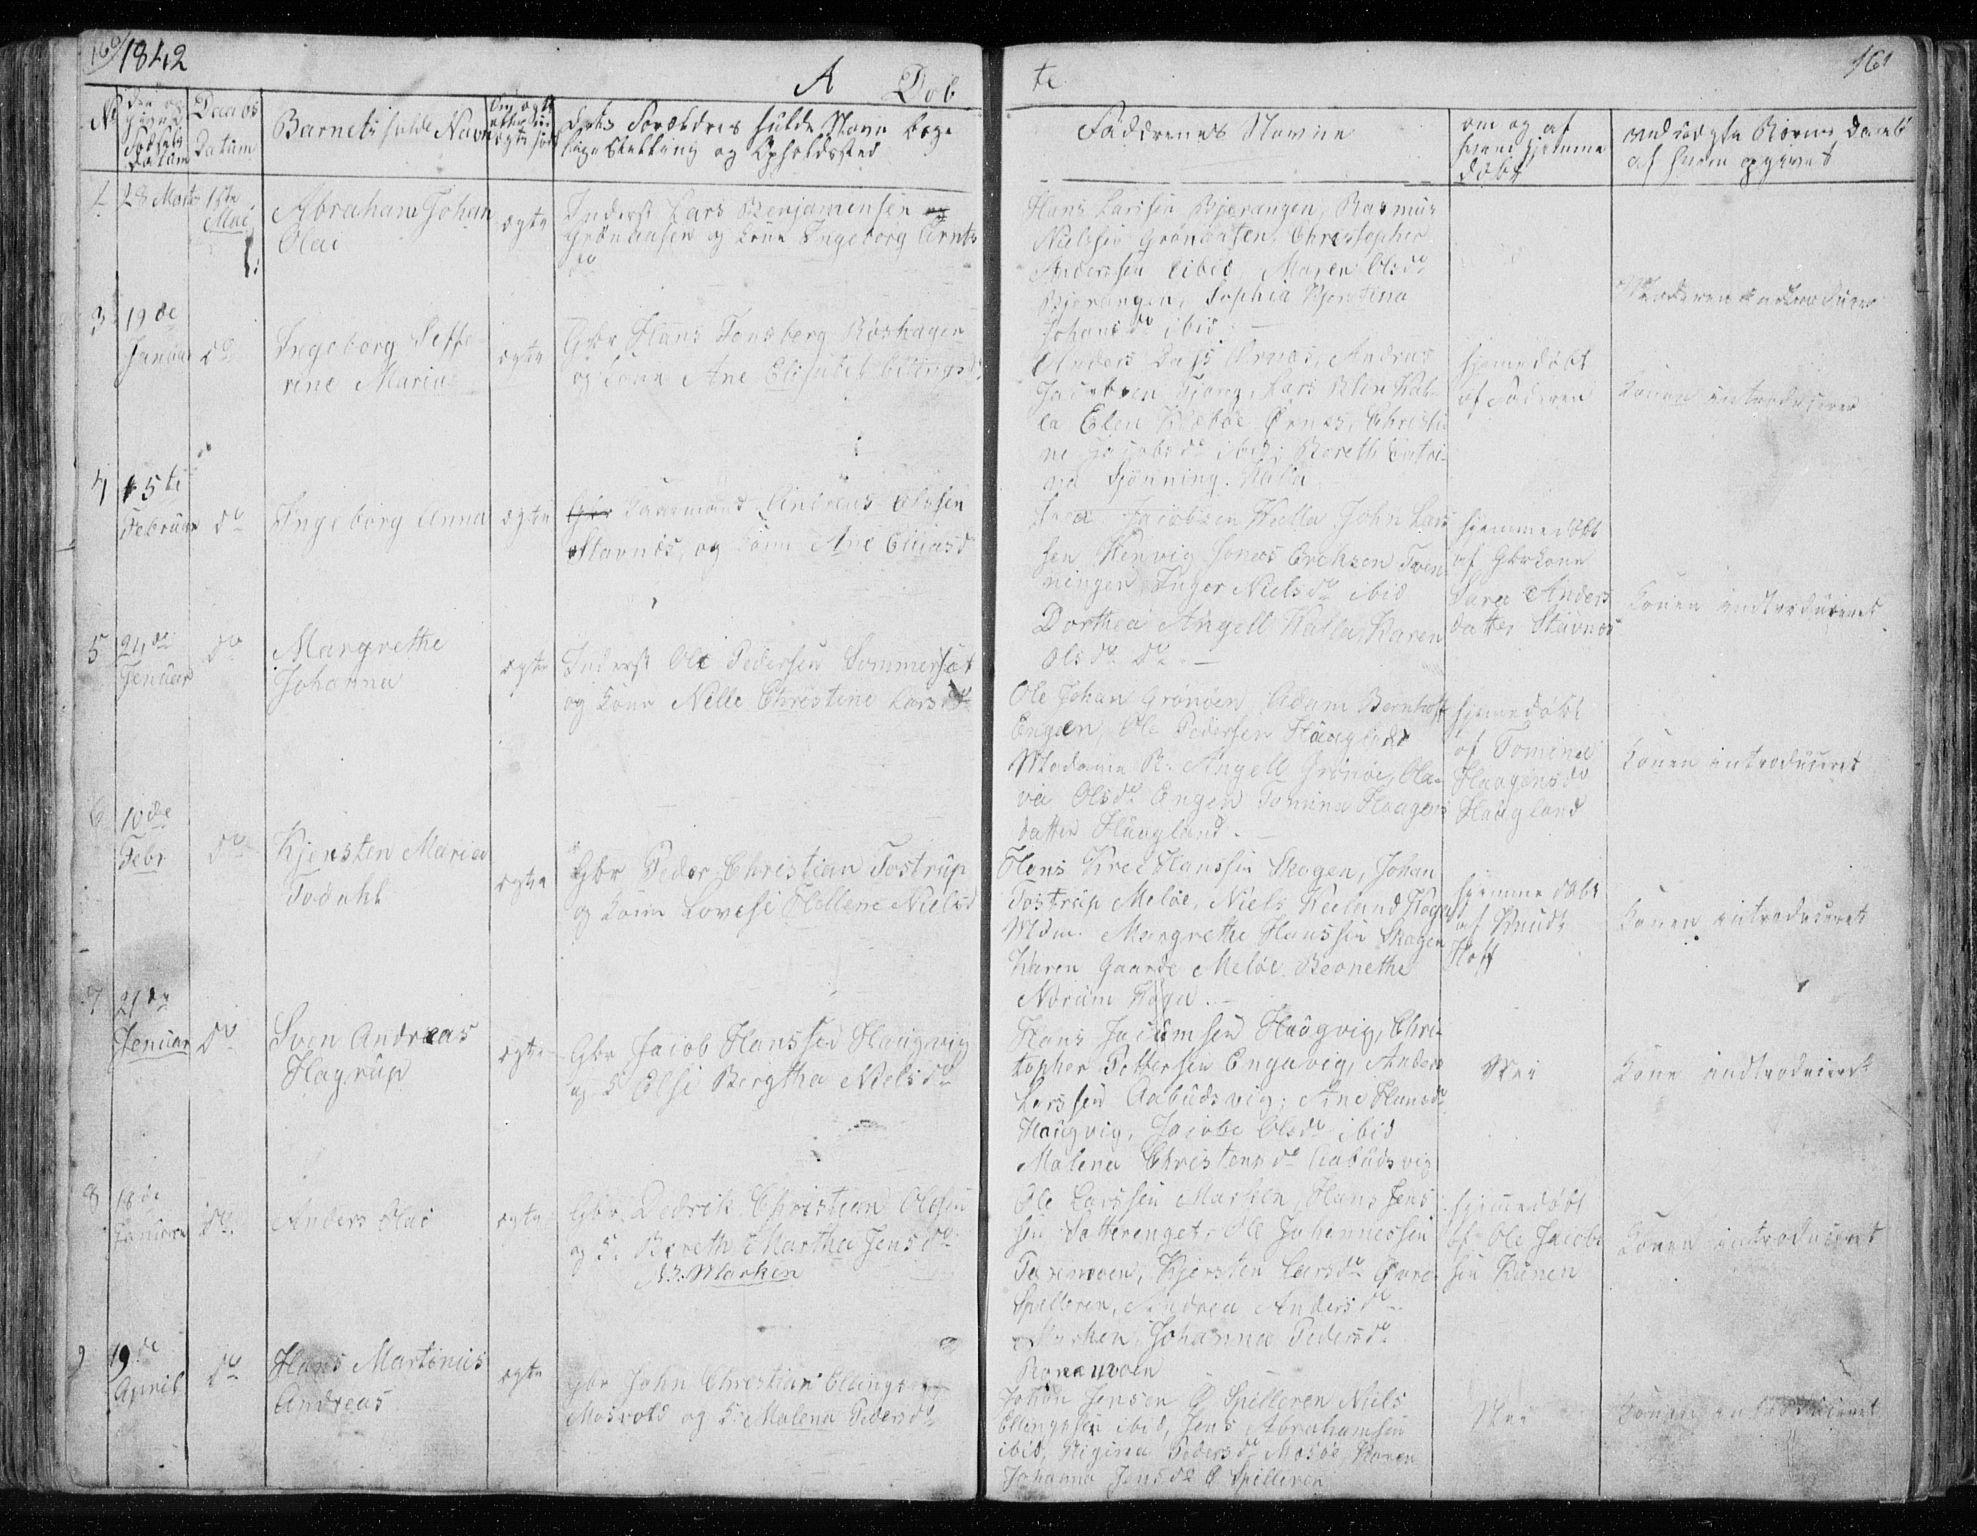 SAT, Ministerialprotokoller, klokkerbøker og fødselsregistre - Nordland, 843/L0632: Klokkerbok nr. 843C01, 1833-1853, s. 160-161